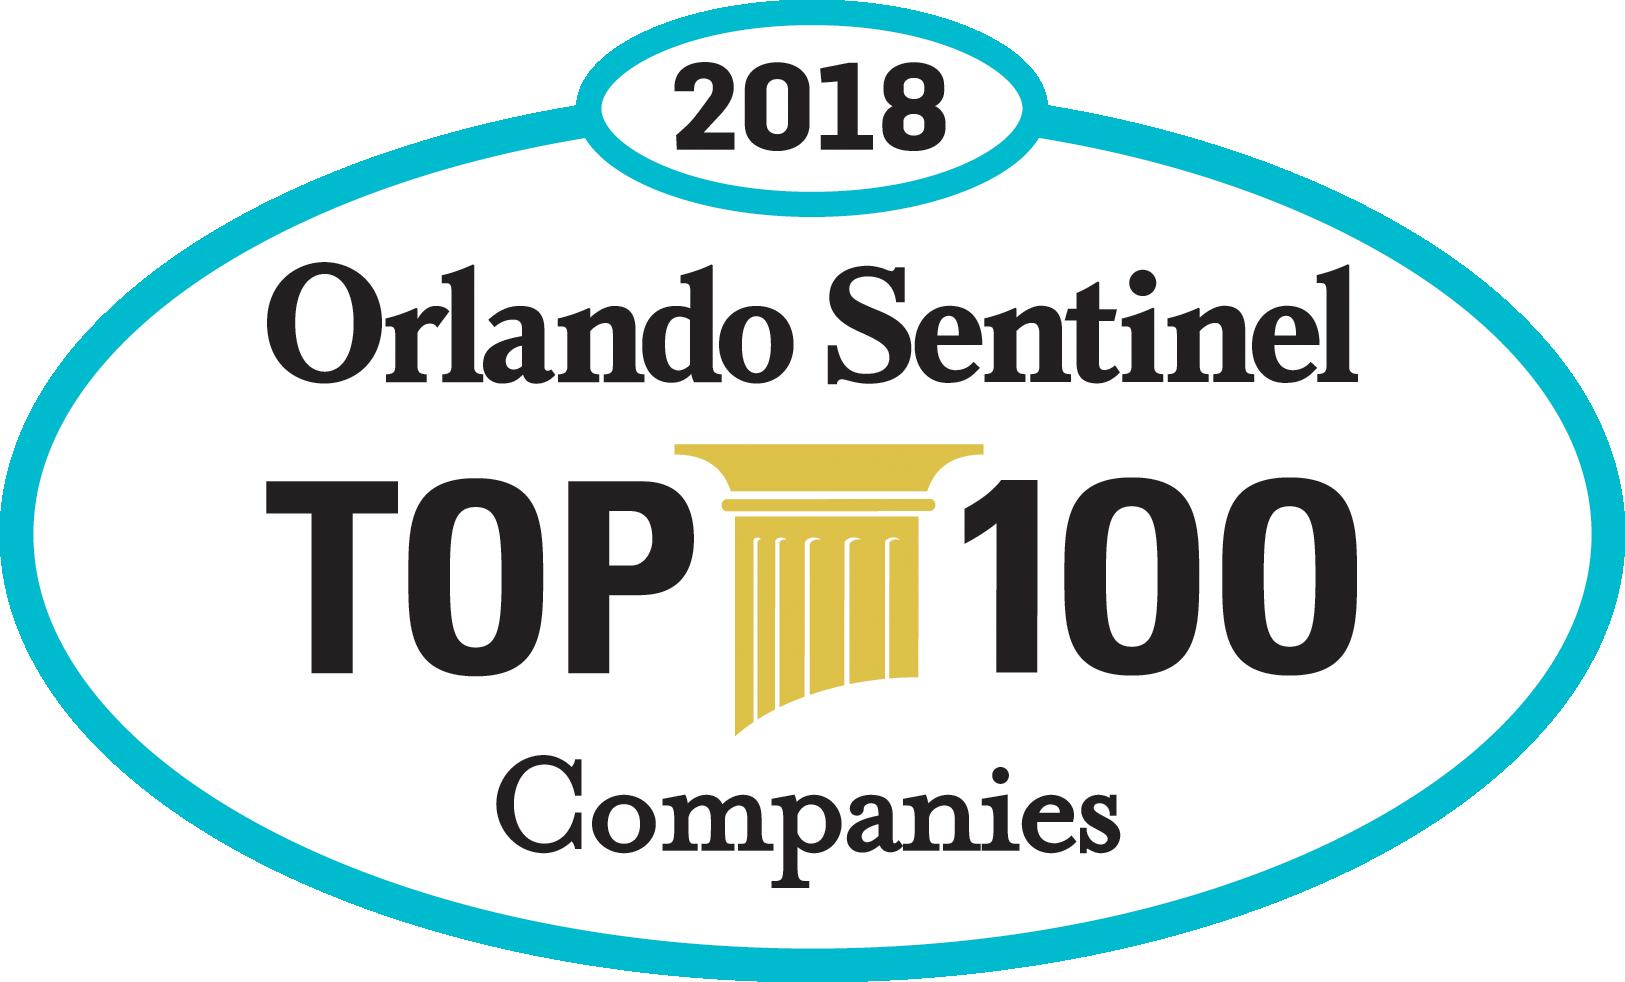 2018 Orlando Sentinel Top 100 Companies